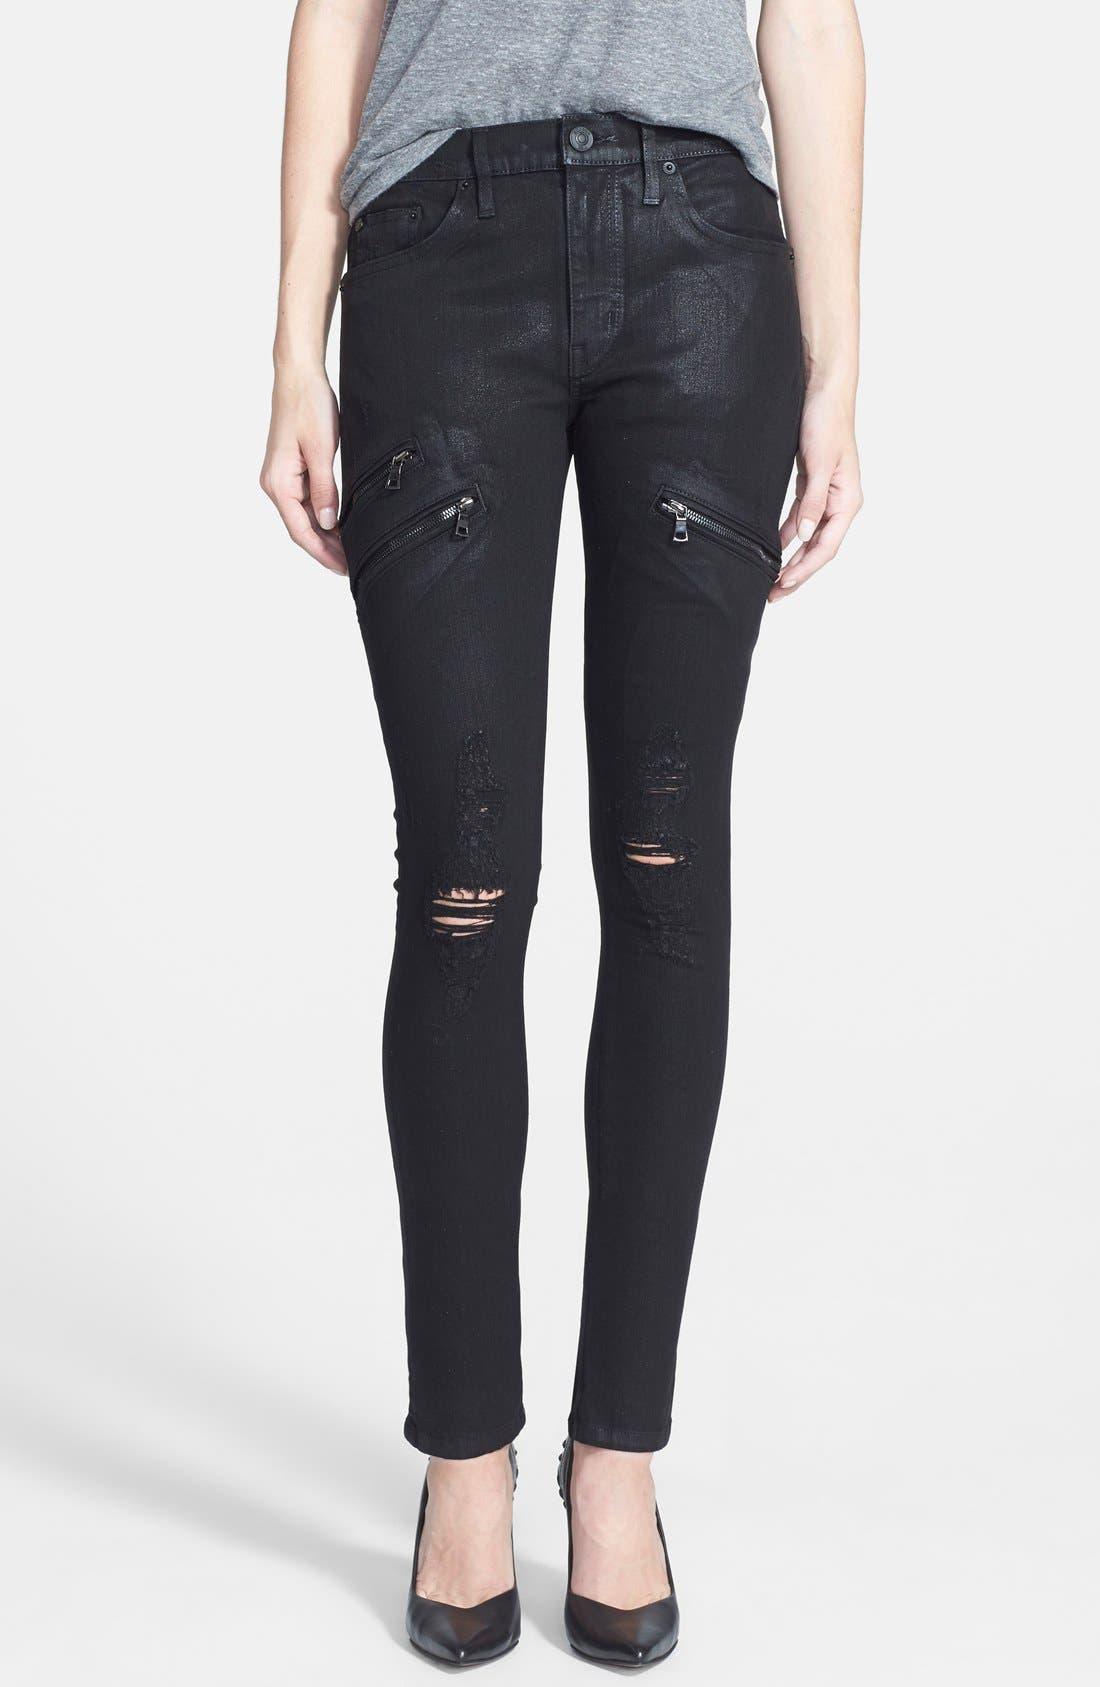 Alternate Image 1 Selected - Hudson Jeans 'Catalyst' Slouch Jeans (Waxed Skylark)